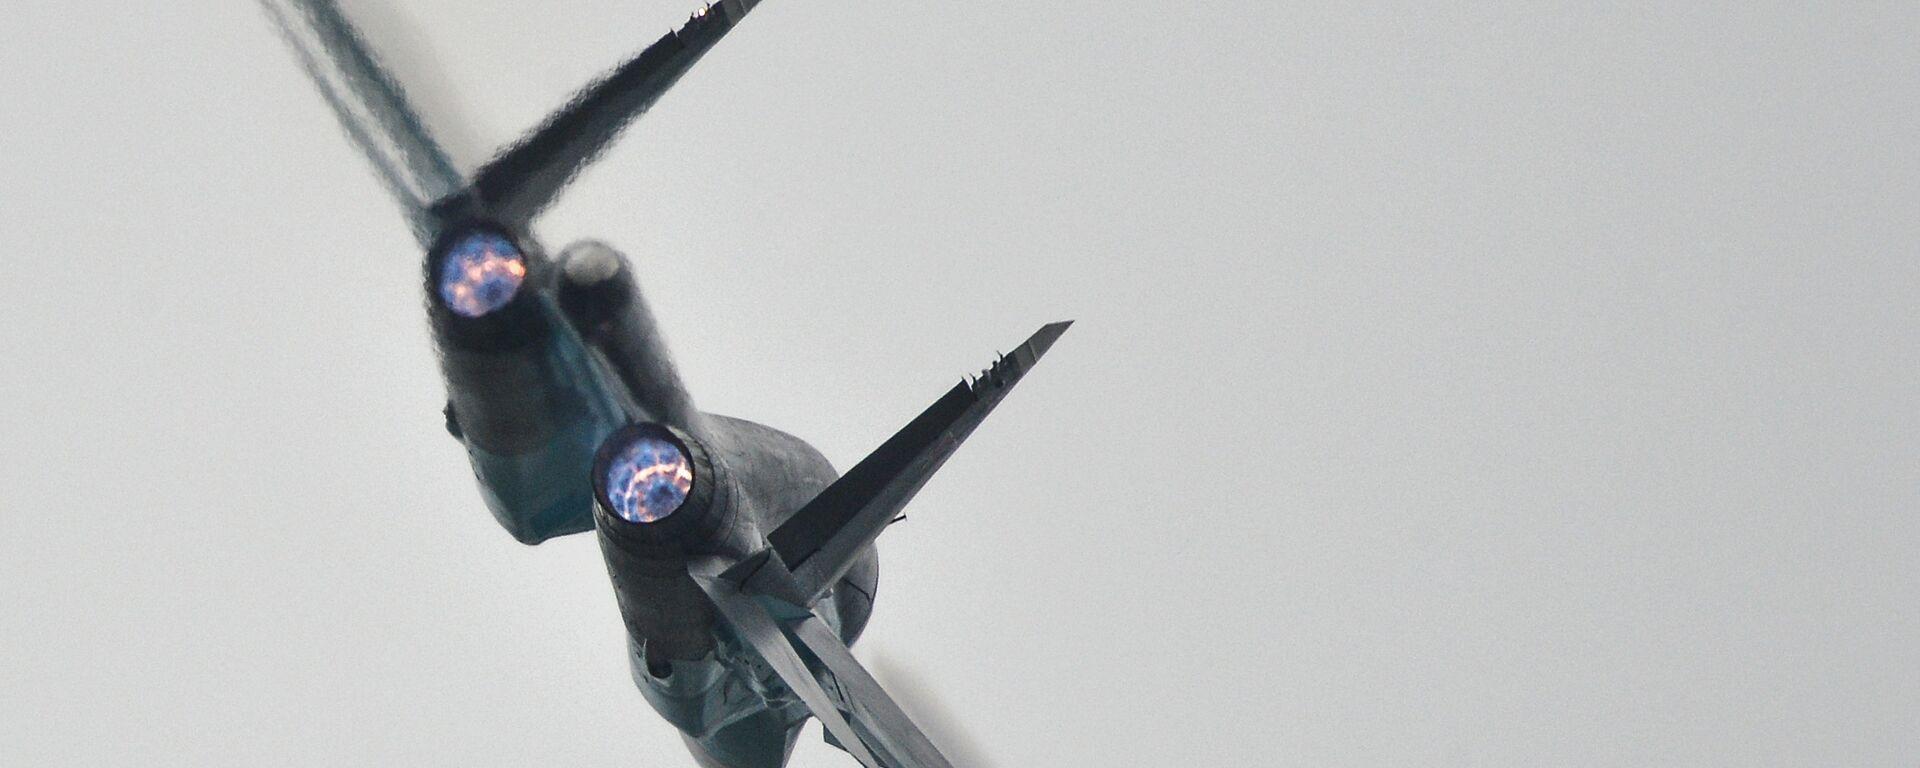 A Su-34 strike aircraft - Sputnik Mundo, 1920, 05.04.2021